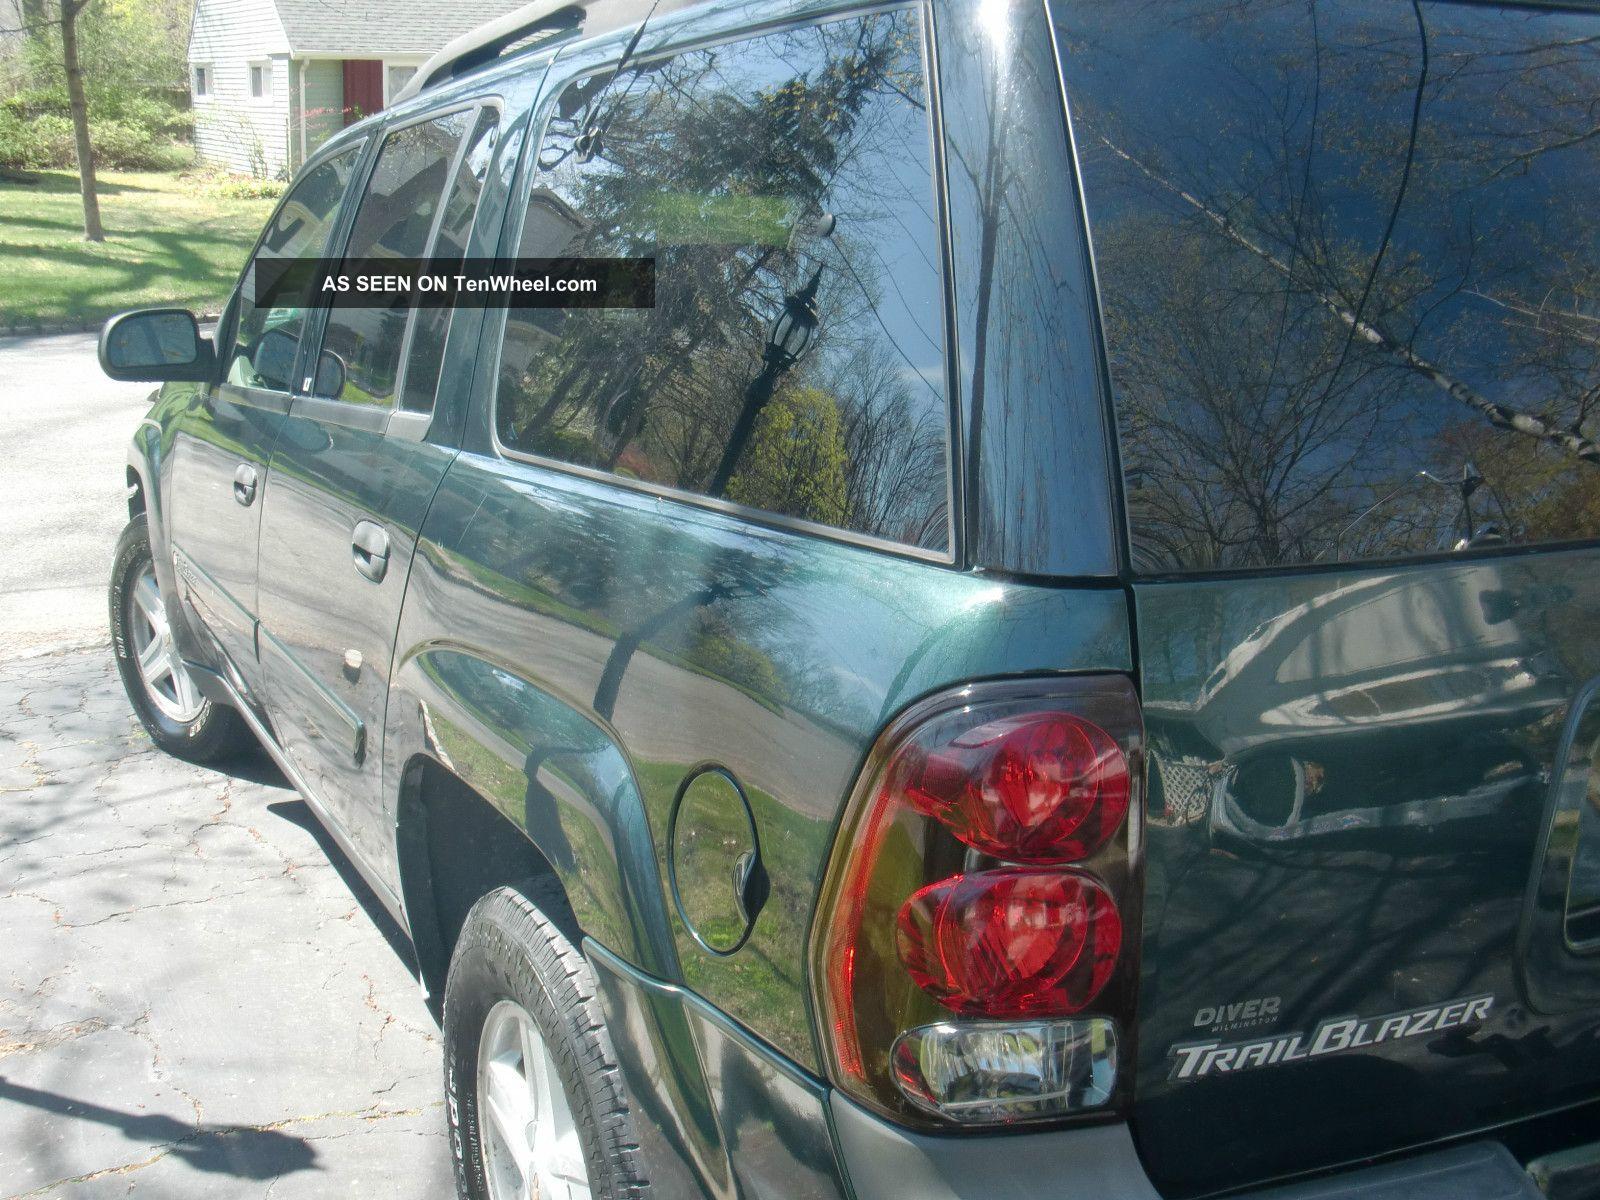 2003 Chevrolet Trailblazer Lt Ext 4wd Chevy Cd Player